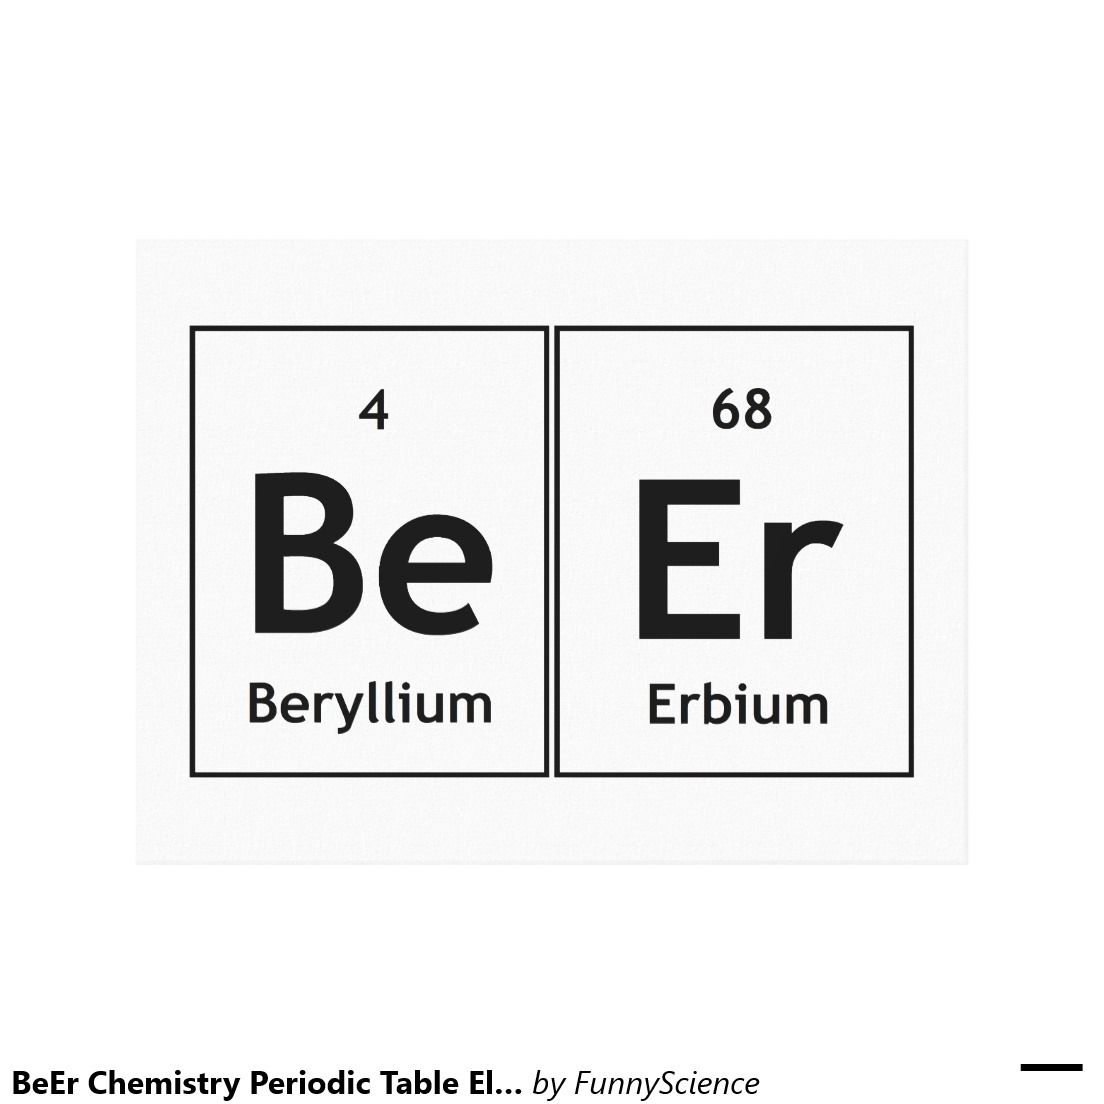 Beer chemistry periodic table element symbols word canvas print beer chemistry periodic table element symbols word canvas print biocorpaavc Gallery